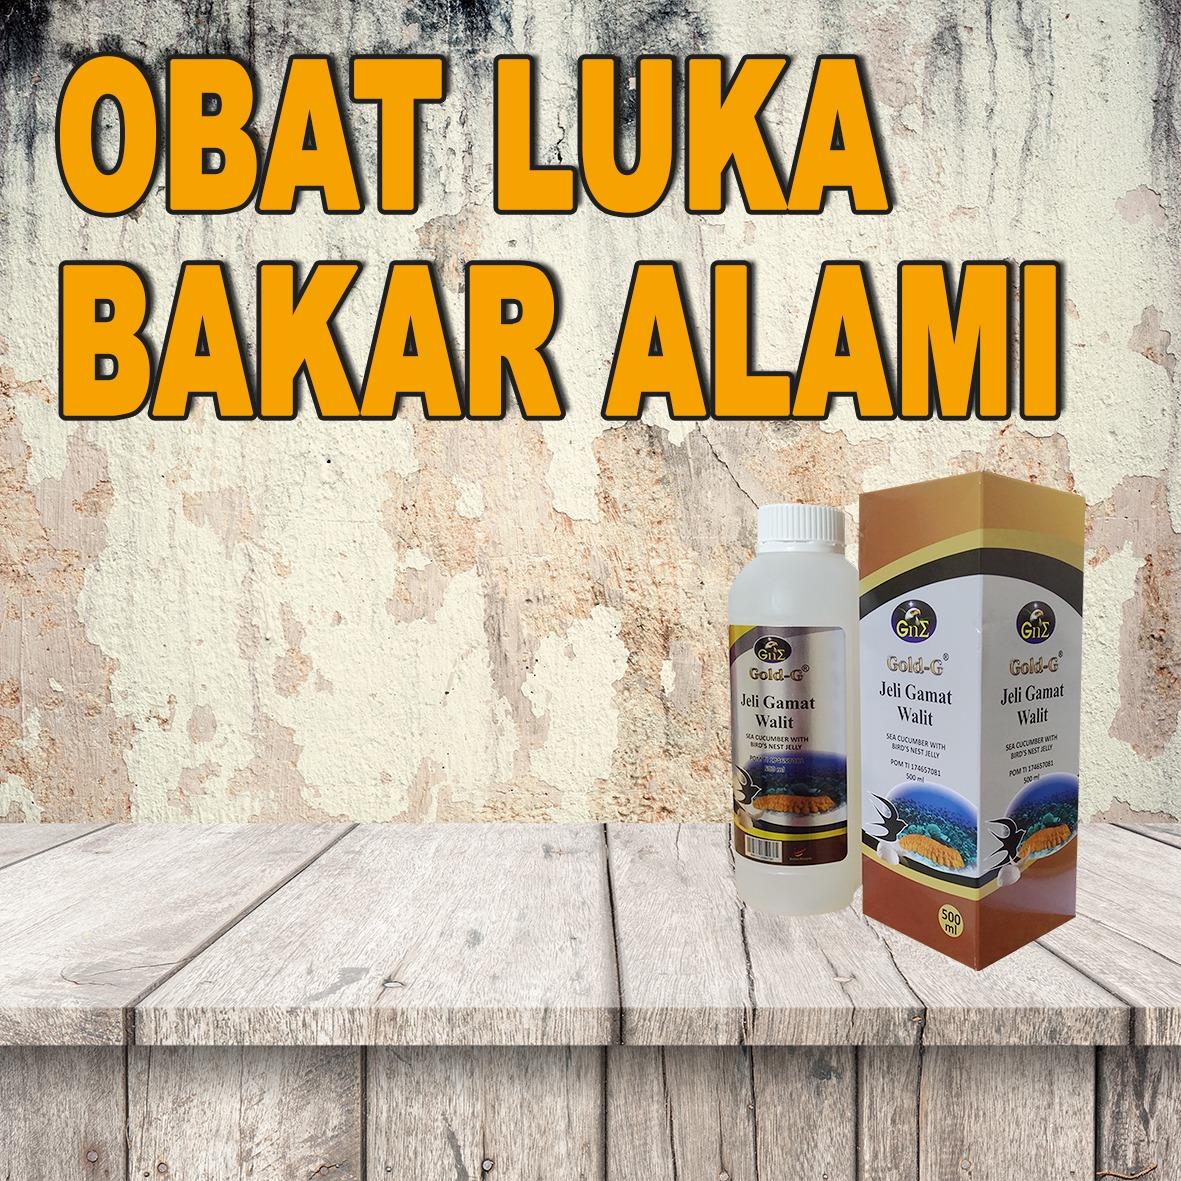 Obat Luka Bakar Ampuh Jelly Gamat Gold G Walet